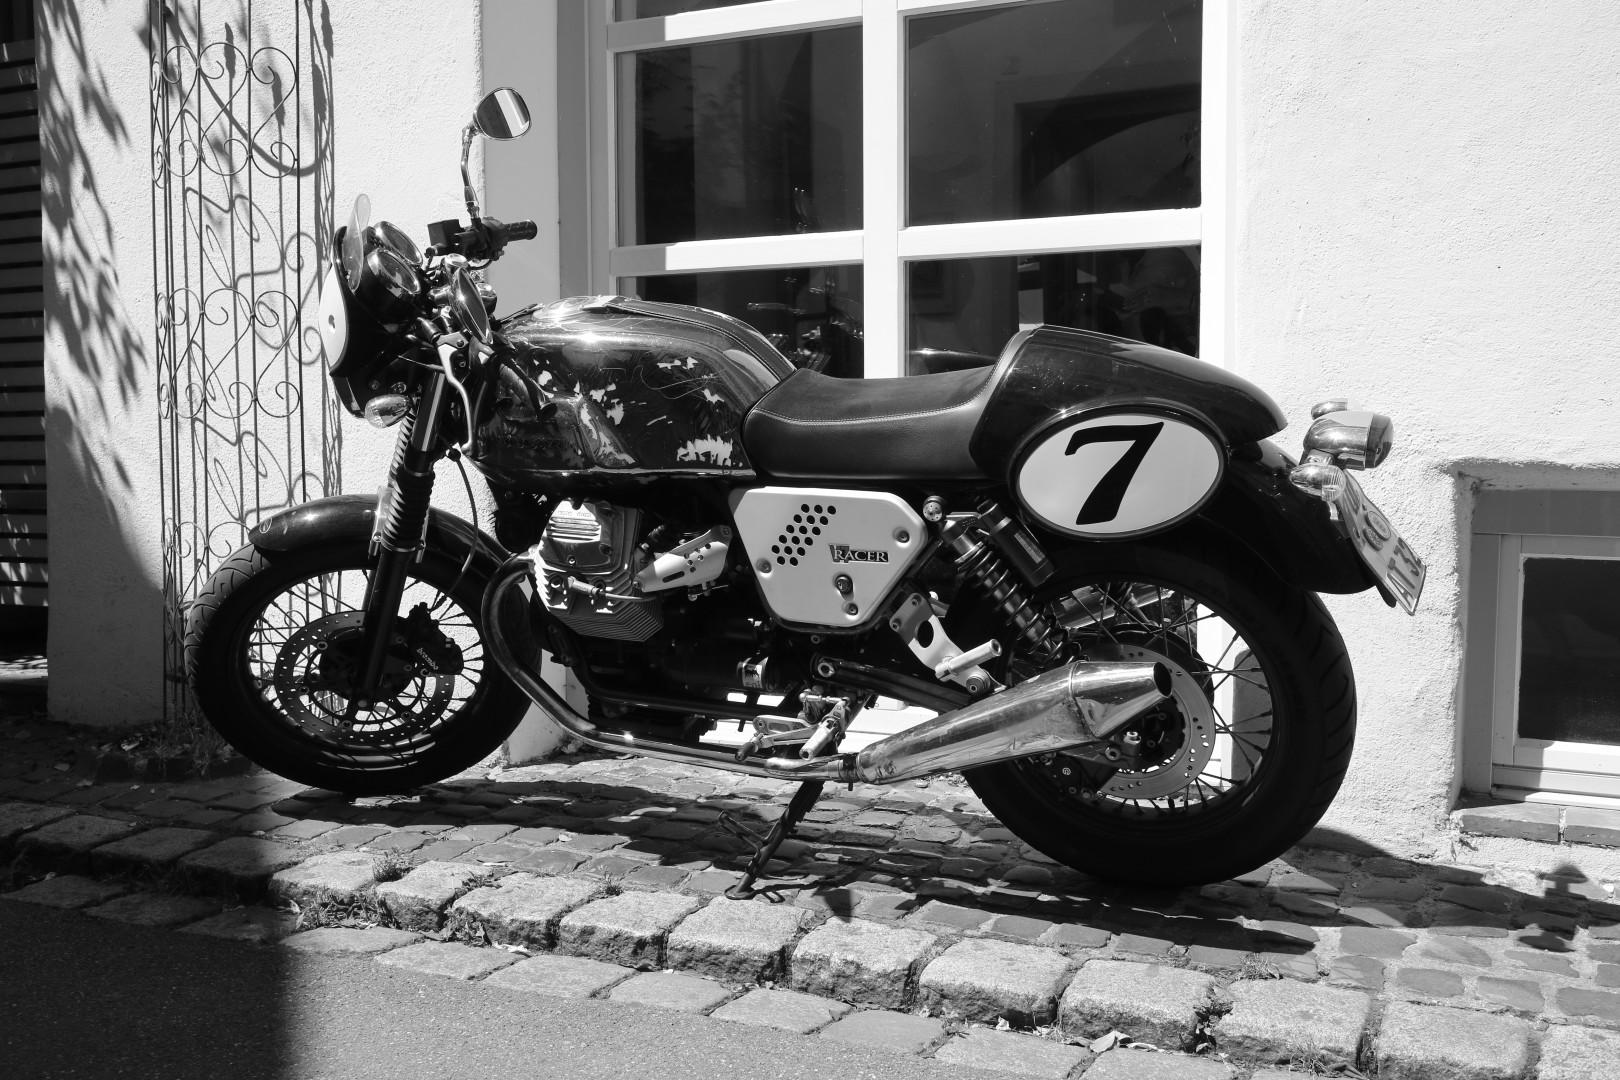 a Moto Guzzi bike, photographed in B/W